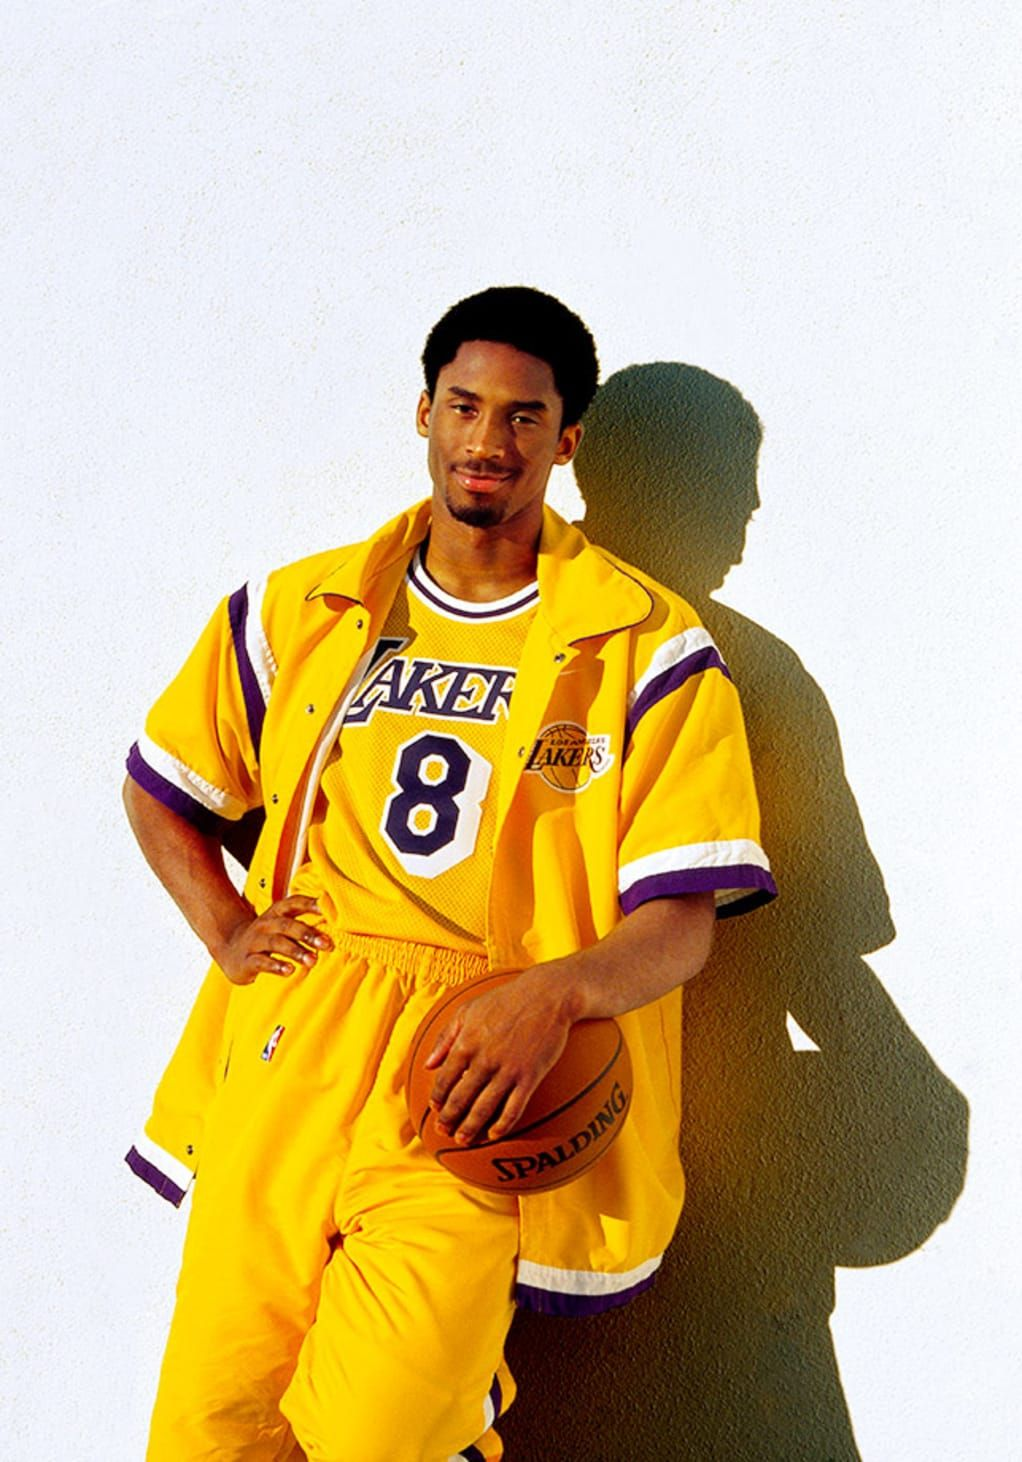 100 Best Kobe Bryant Photos Lakers kobe bryant, Kobe